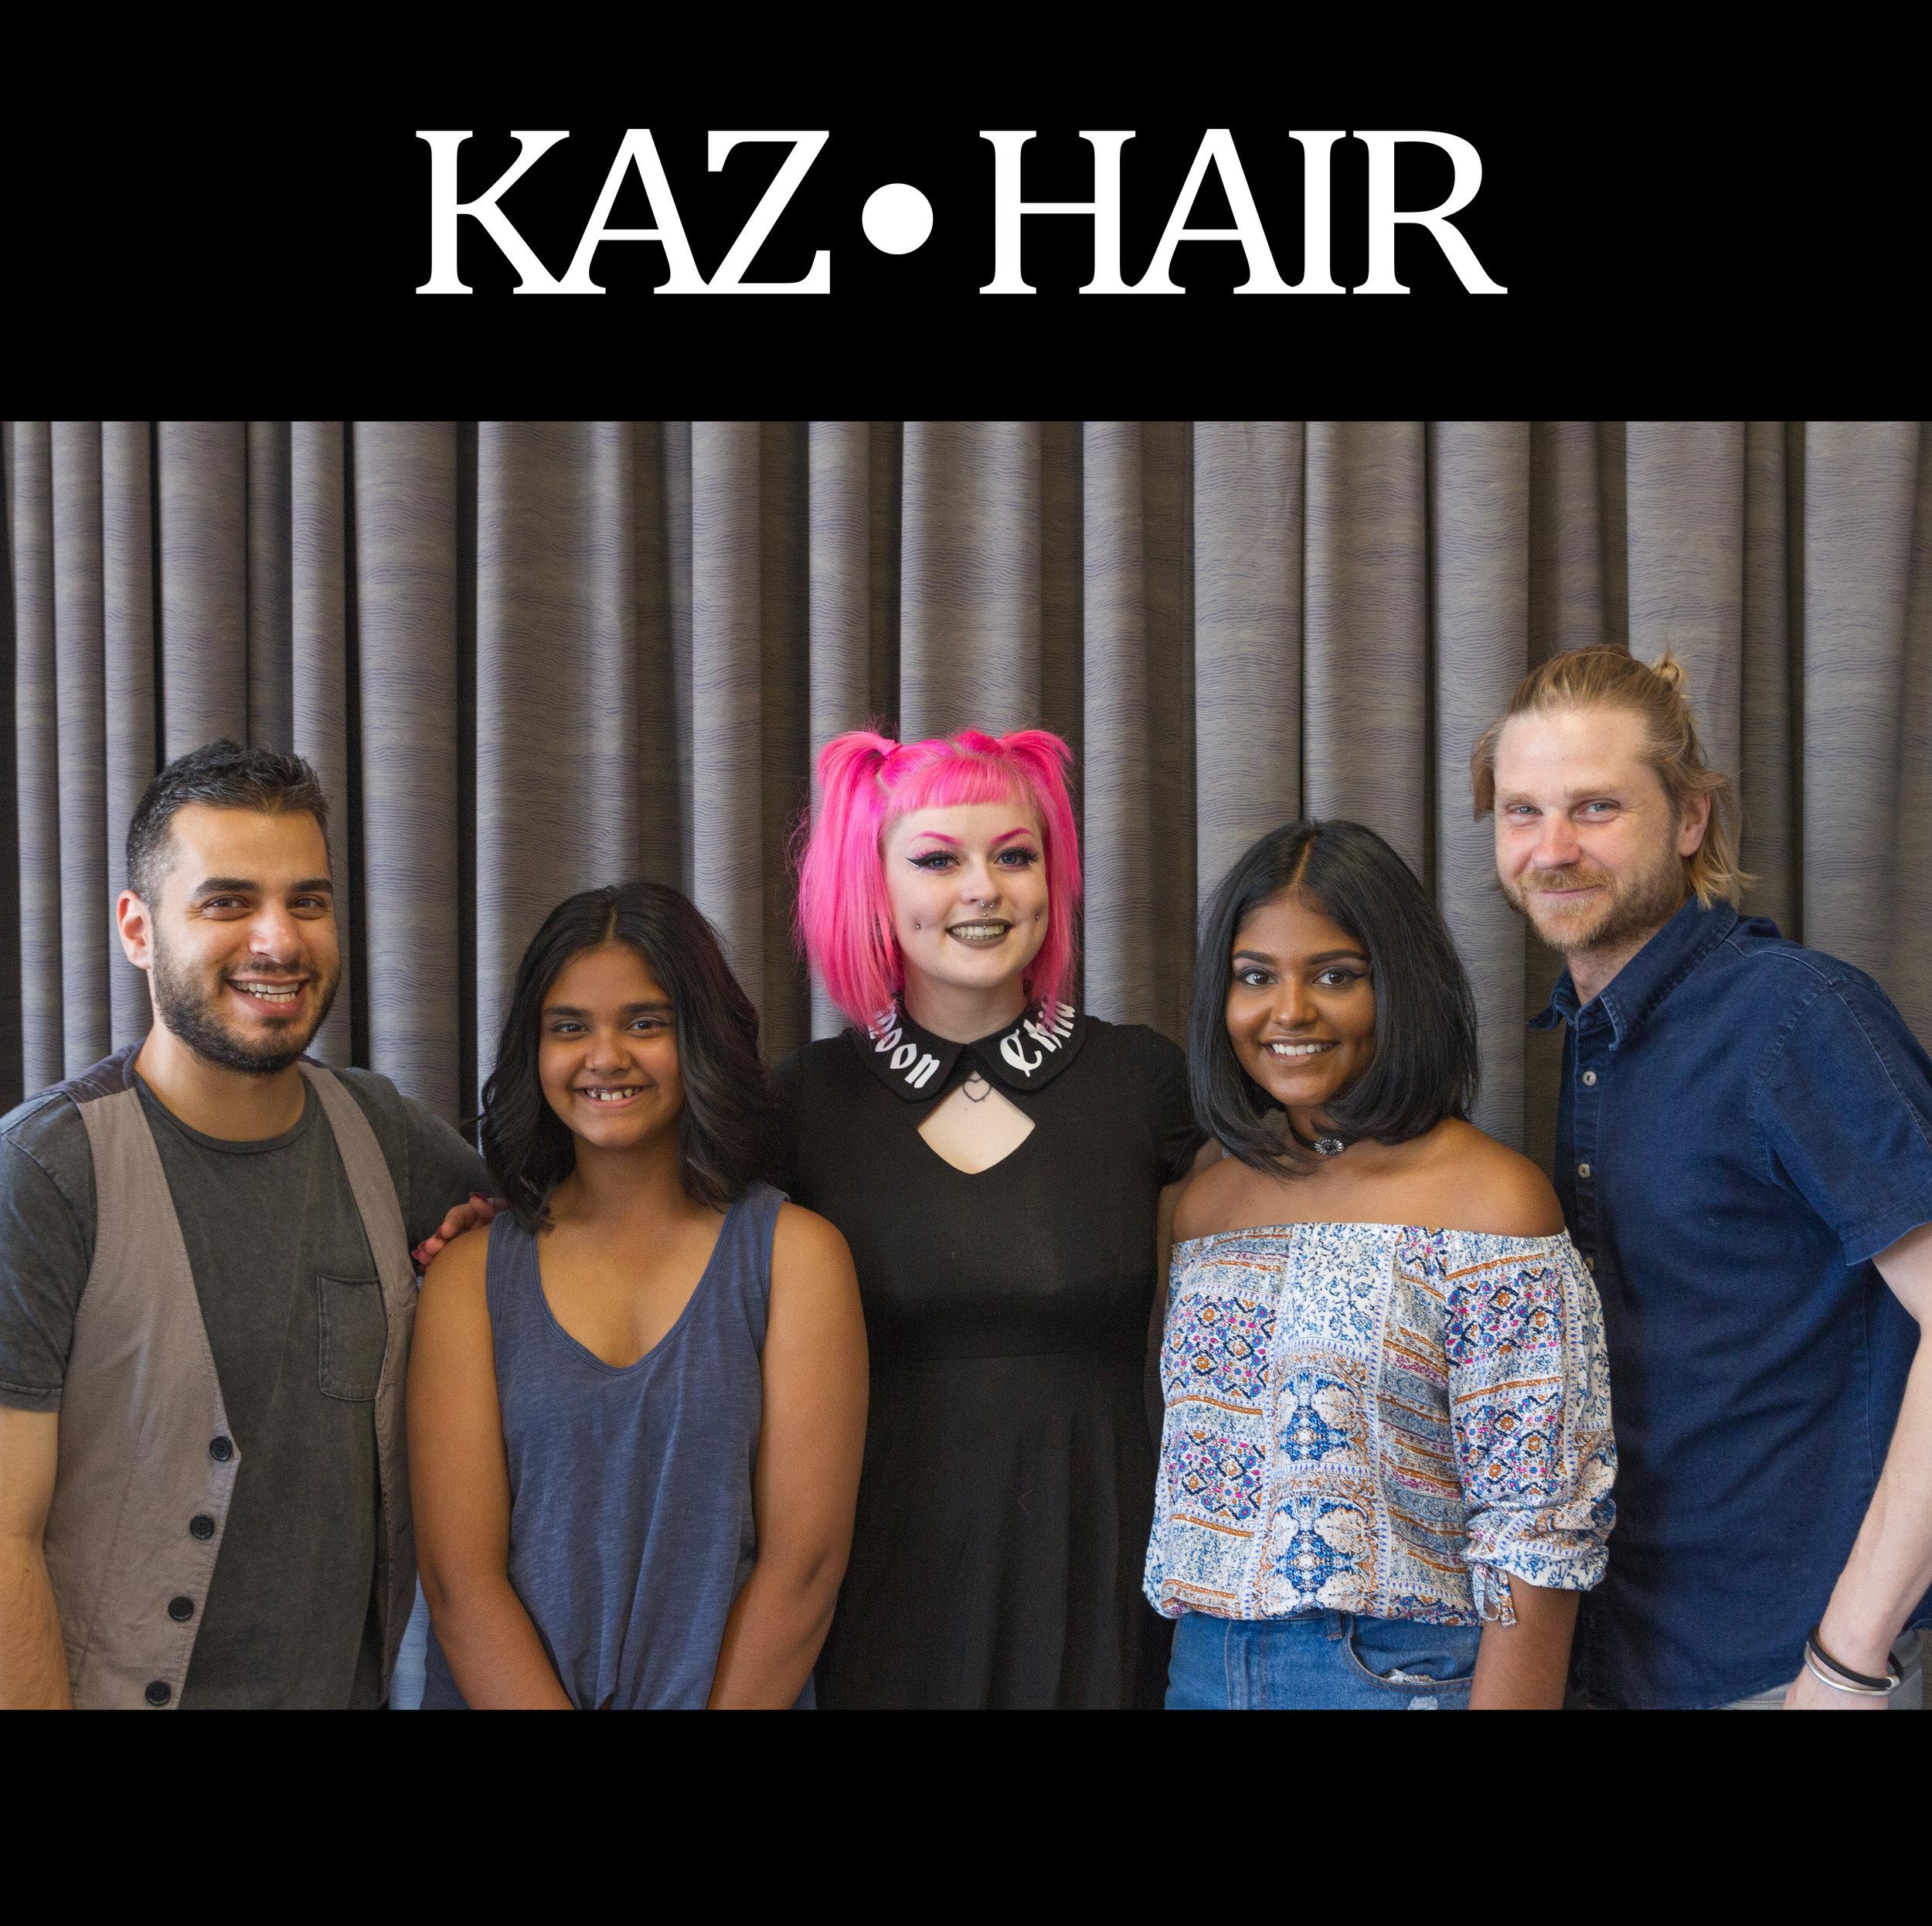 Kaz Hair-Kaz-Team-Adam-Simon-Tammi-with Sryia-and-Yovani-Amelia-McLeod-Photography-1-1.JPG